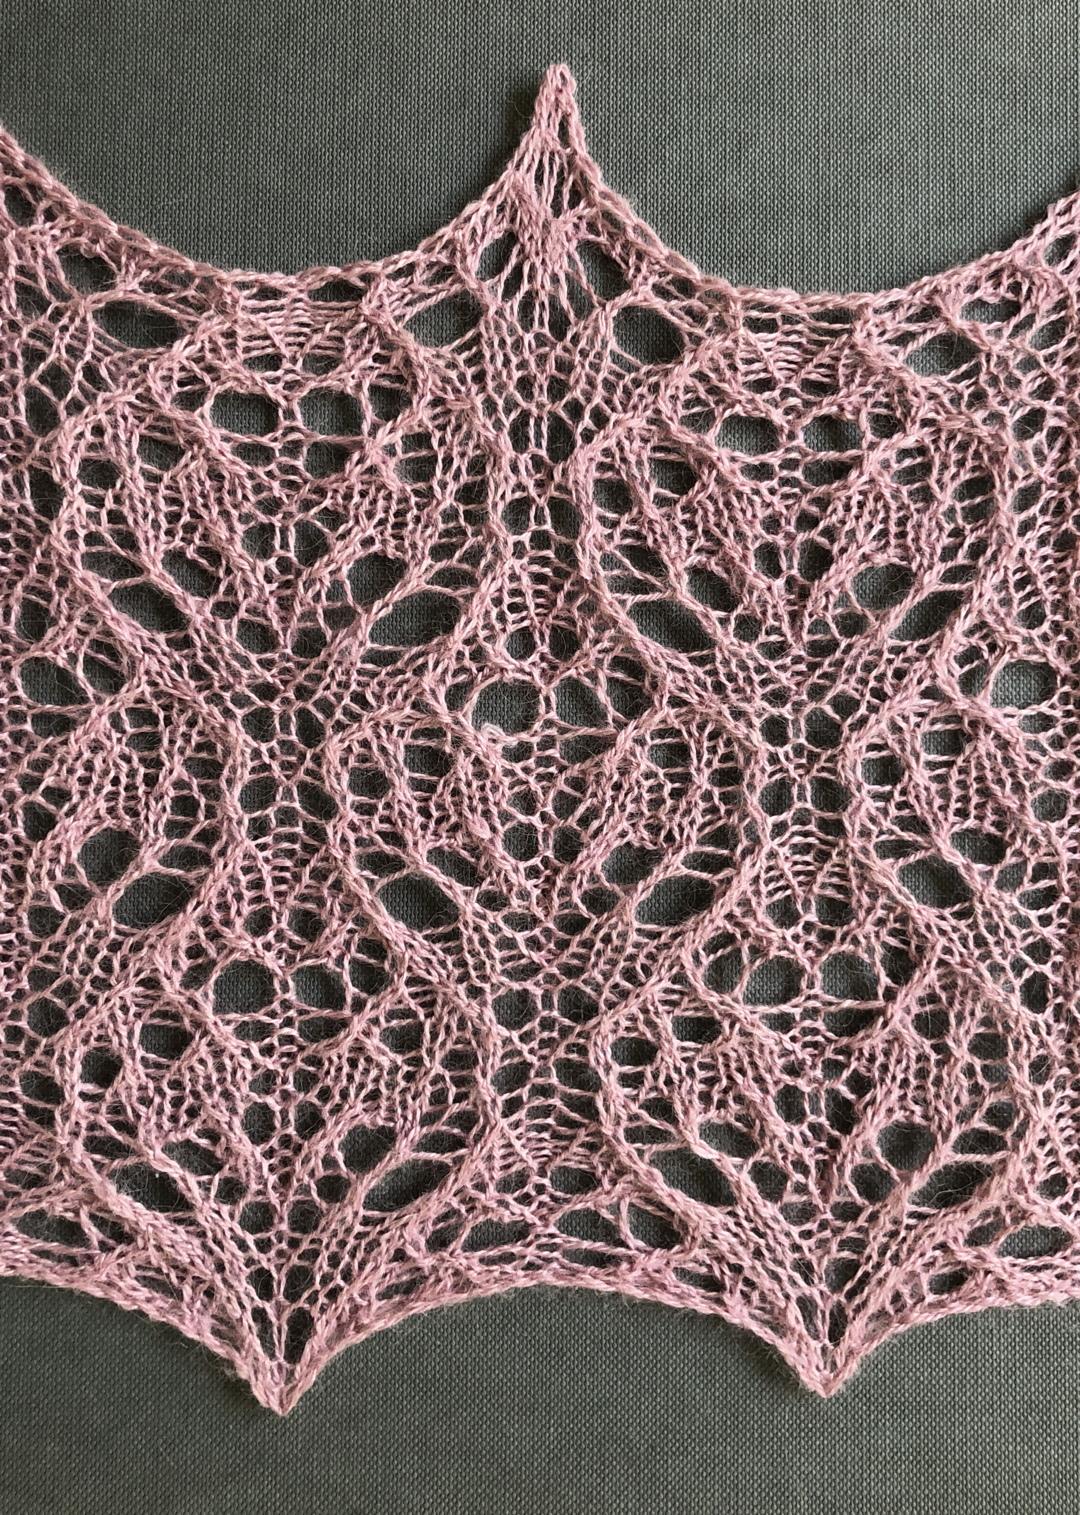 Sweetheart: a free lace knitting stitch pattern – String Geekery